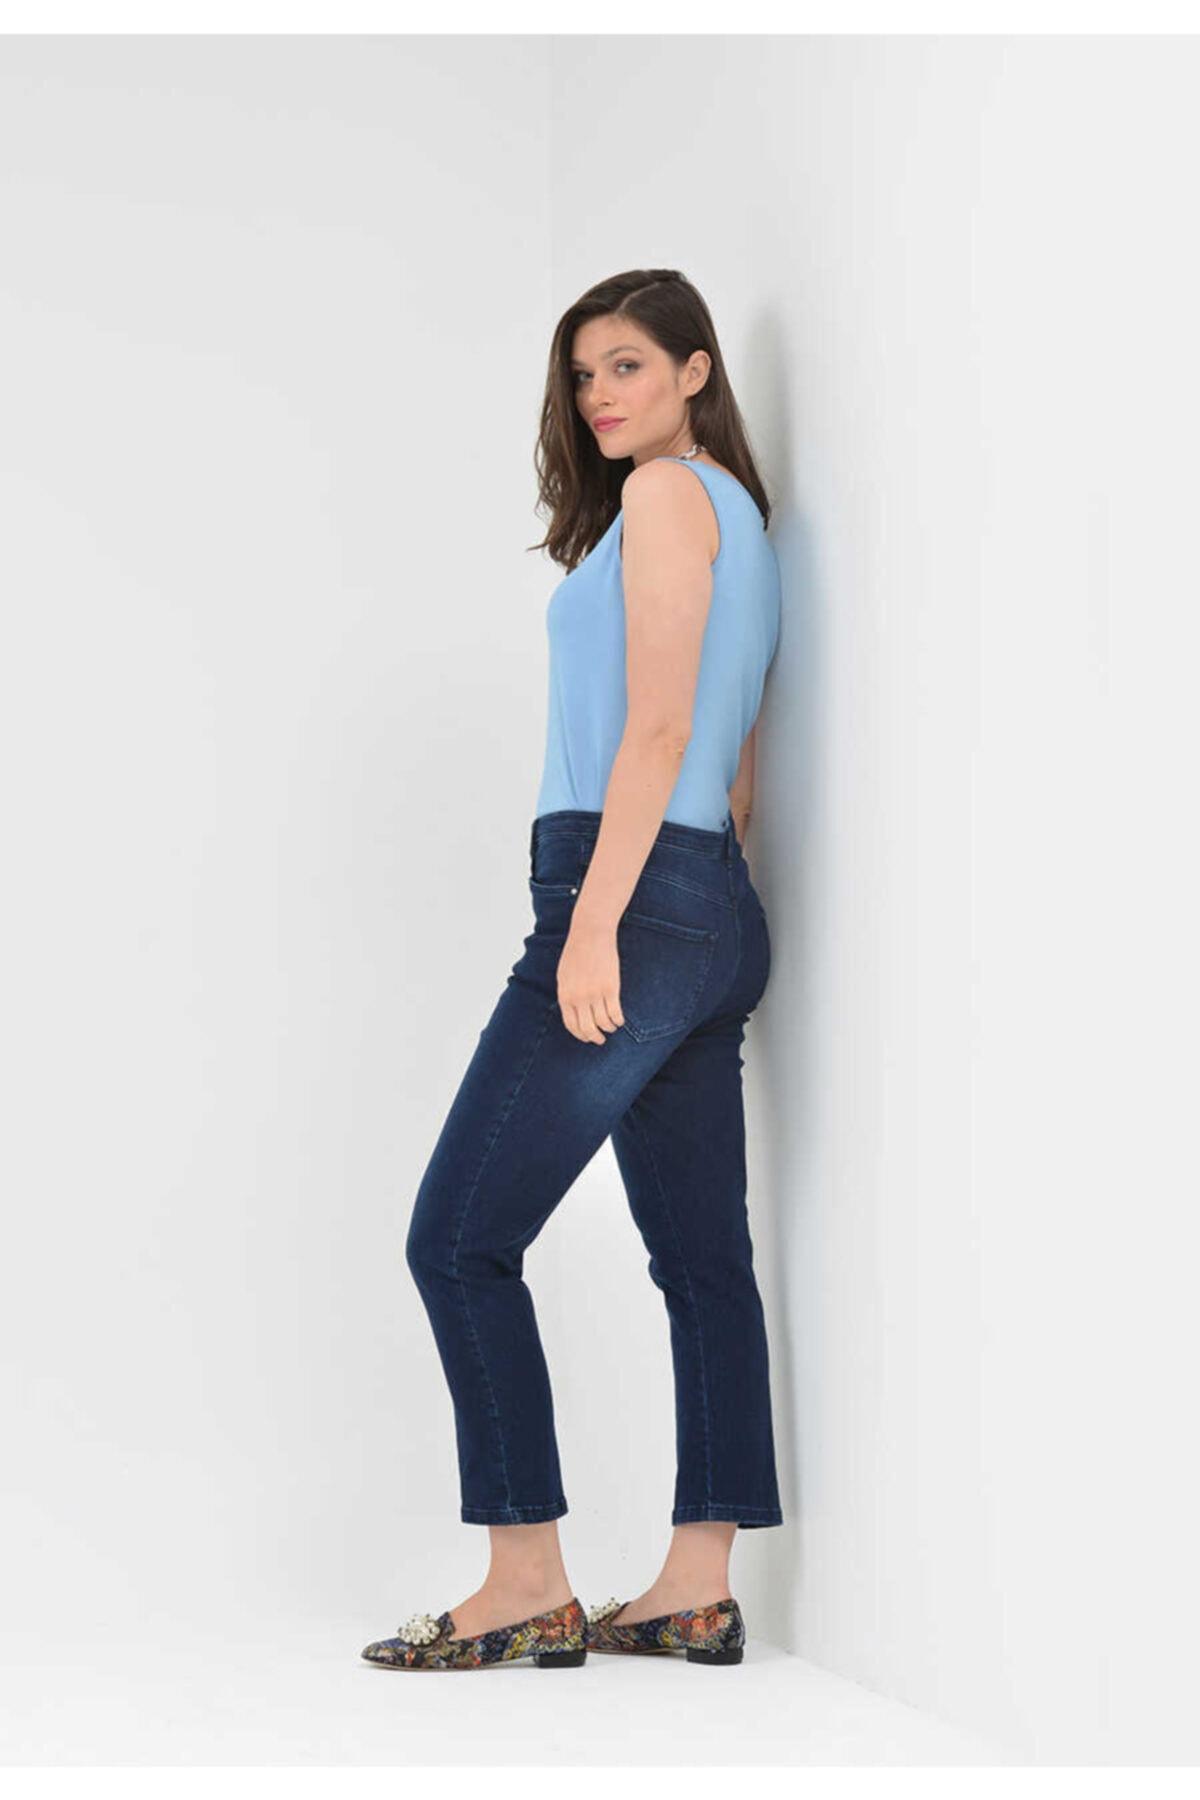 TOLGA SARAÇOĞLU - Pantolon0016 Gizli Lastik Kısa Kot Pantolon 2